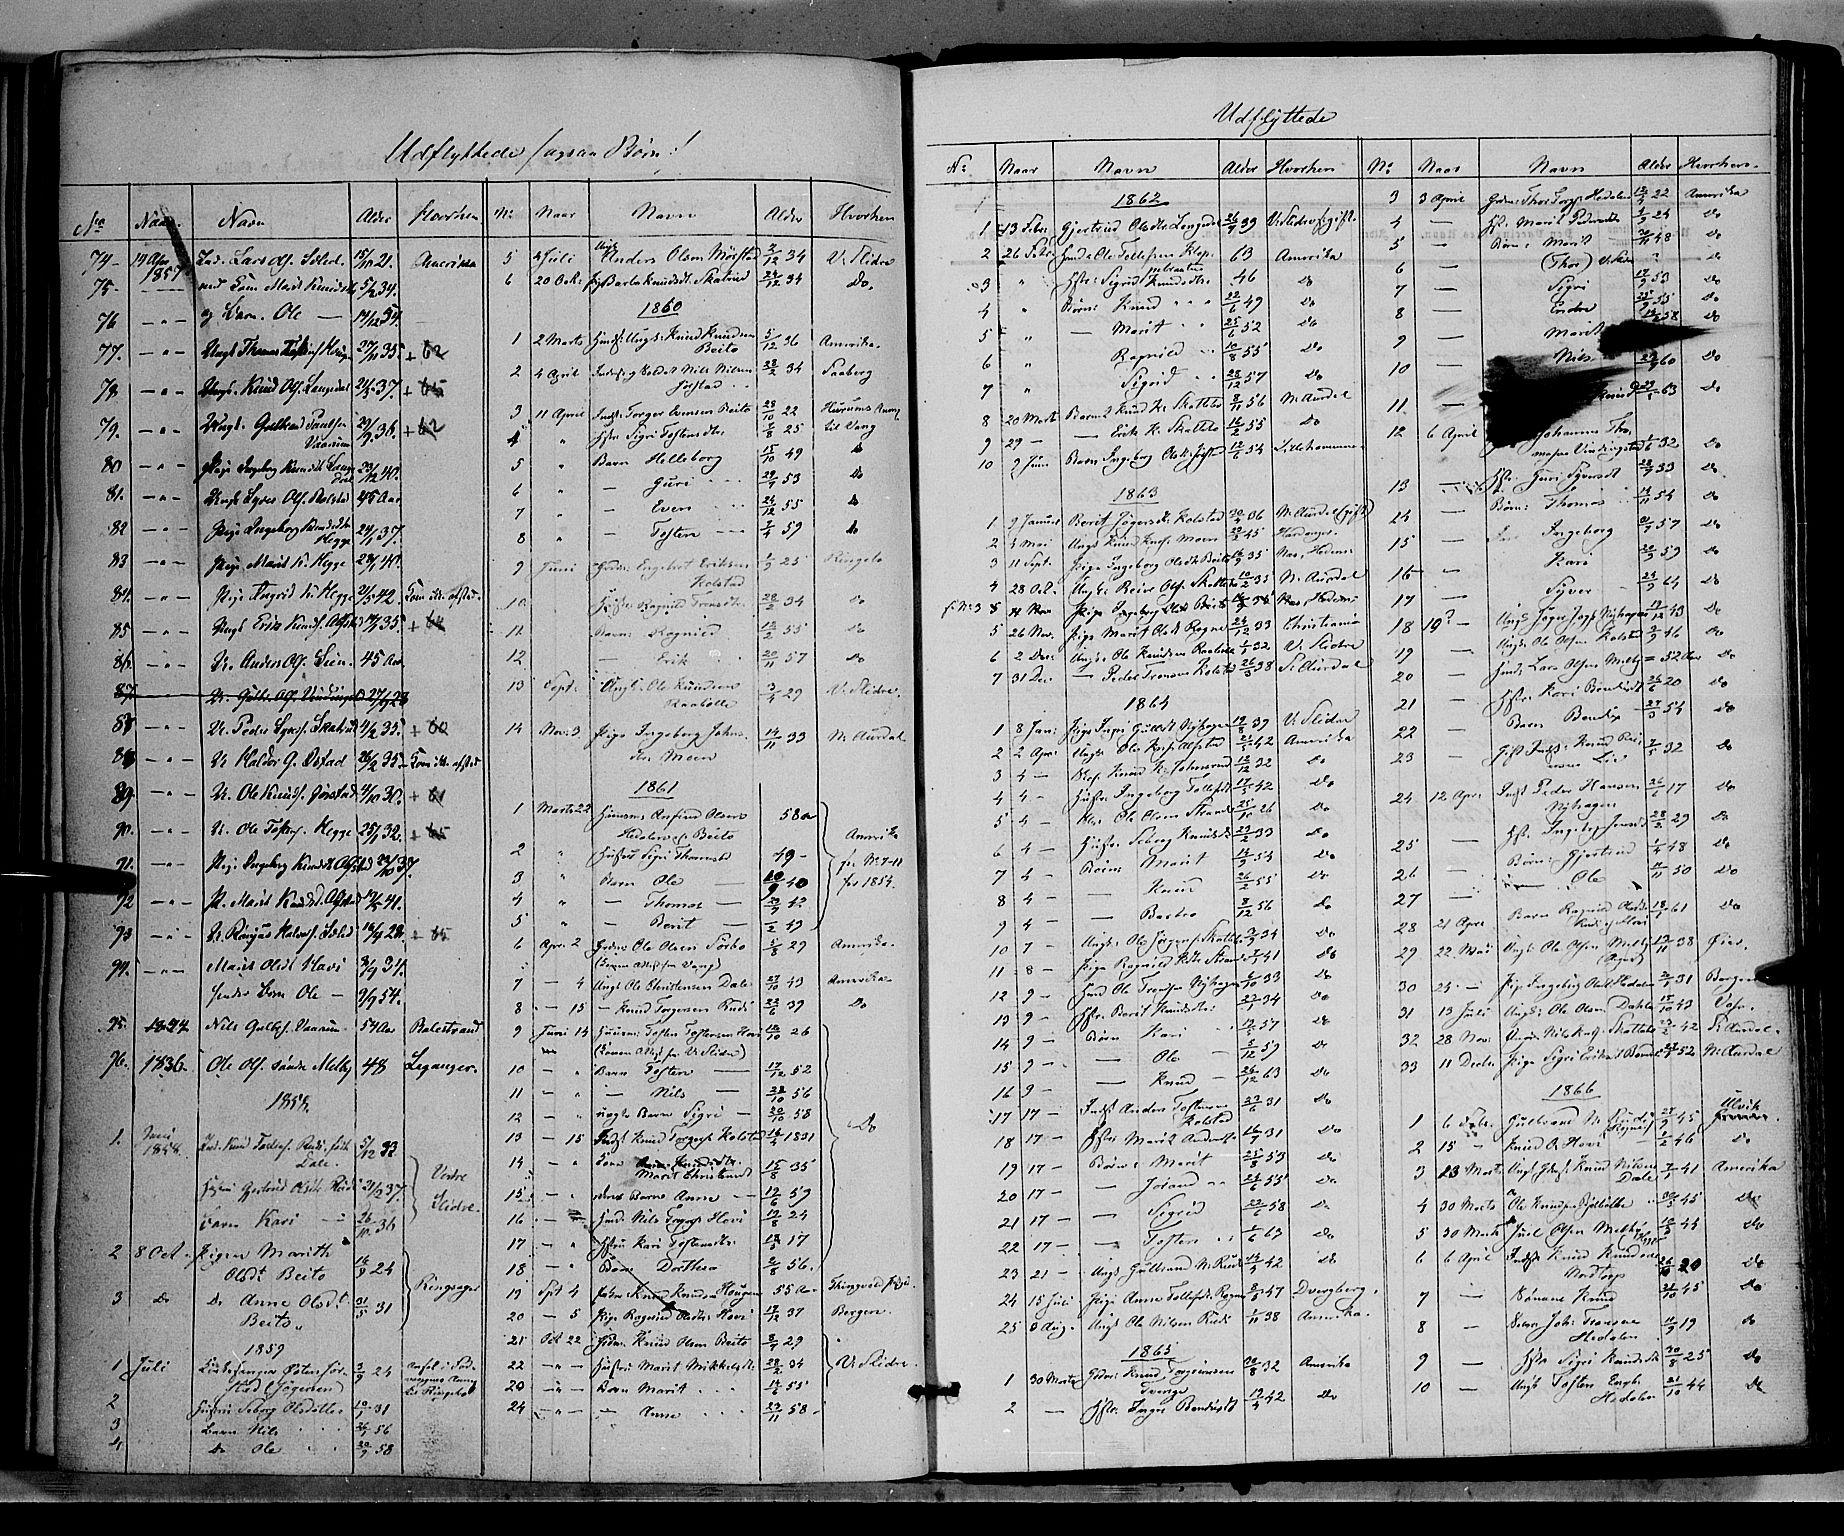 SAH, Øystre Slidre prestekontor, Ministerialbok nr. 1, 1849-1874, s. 246b